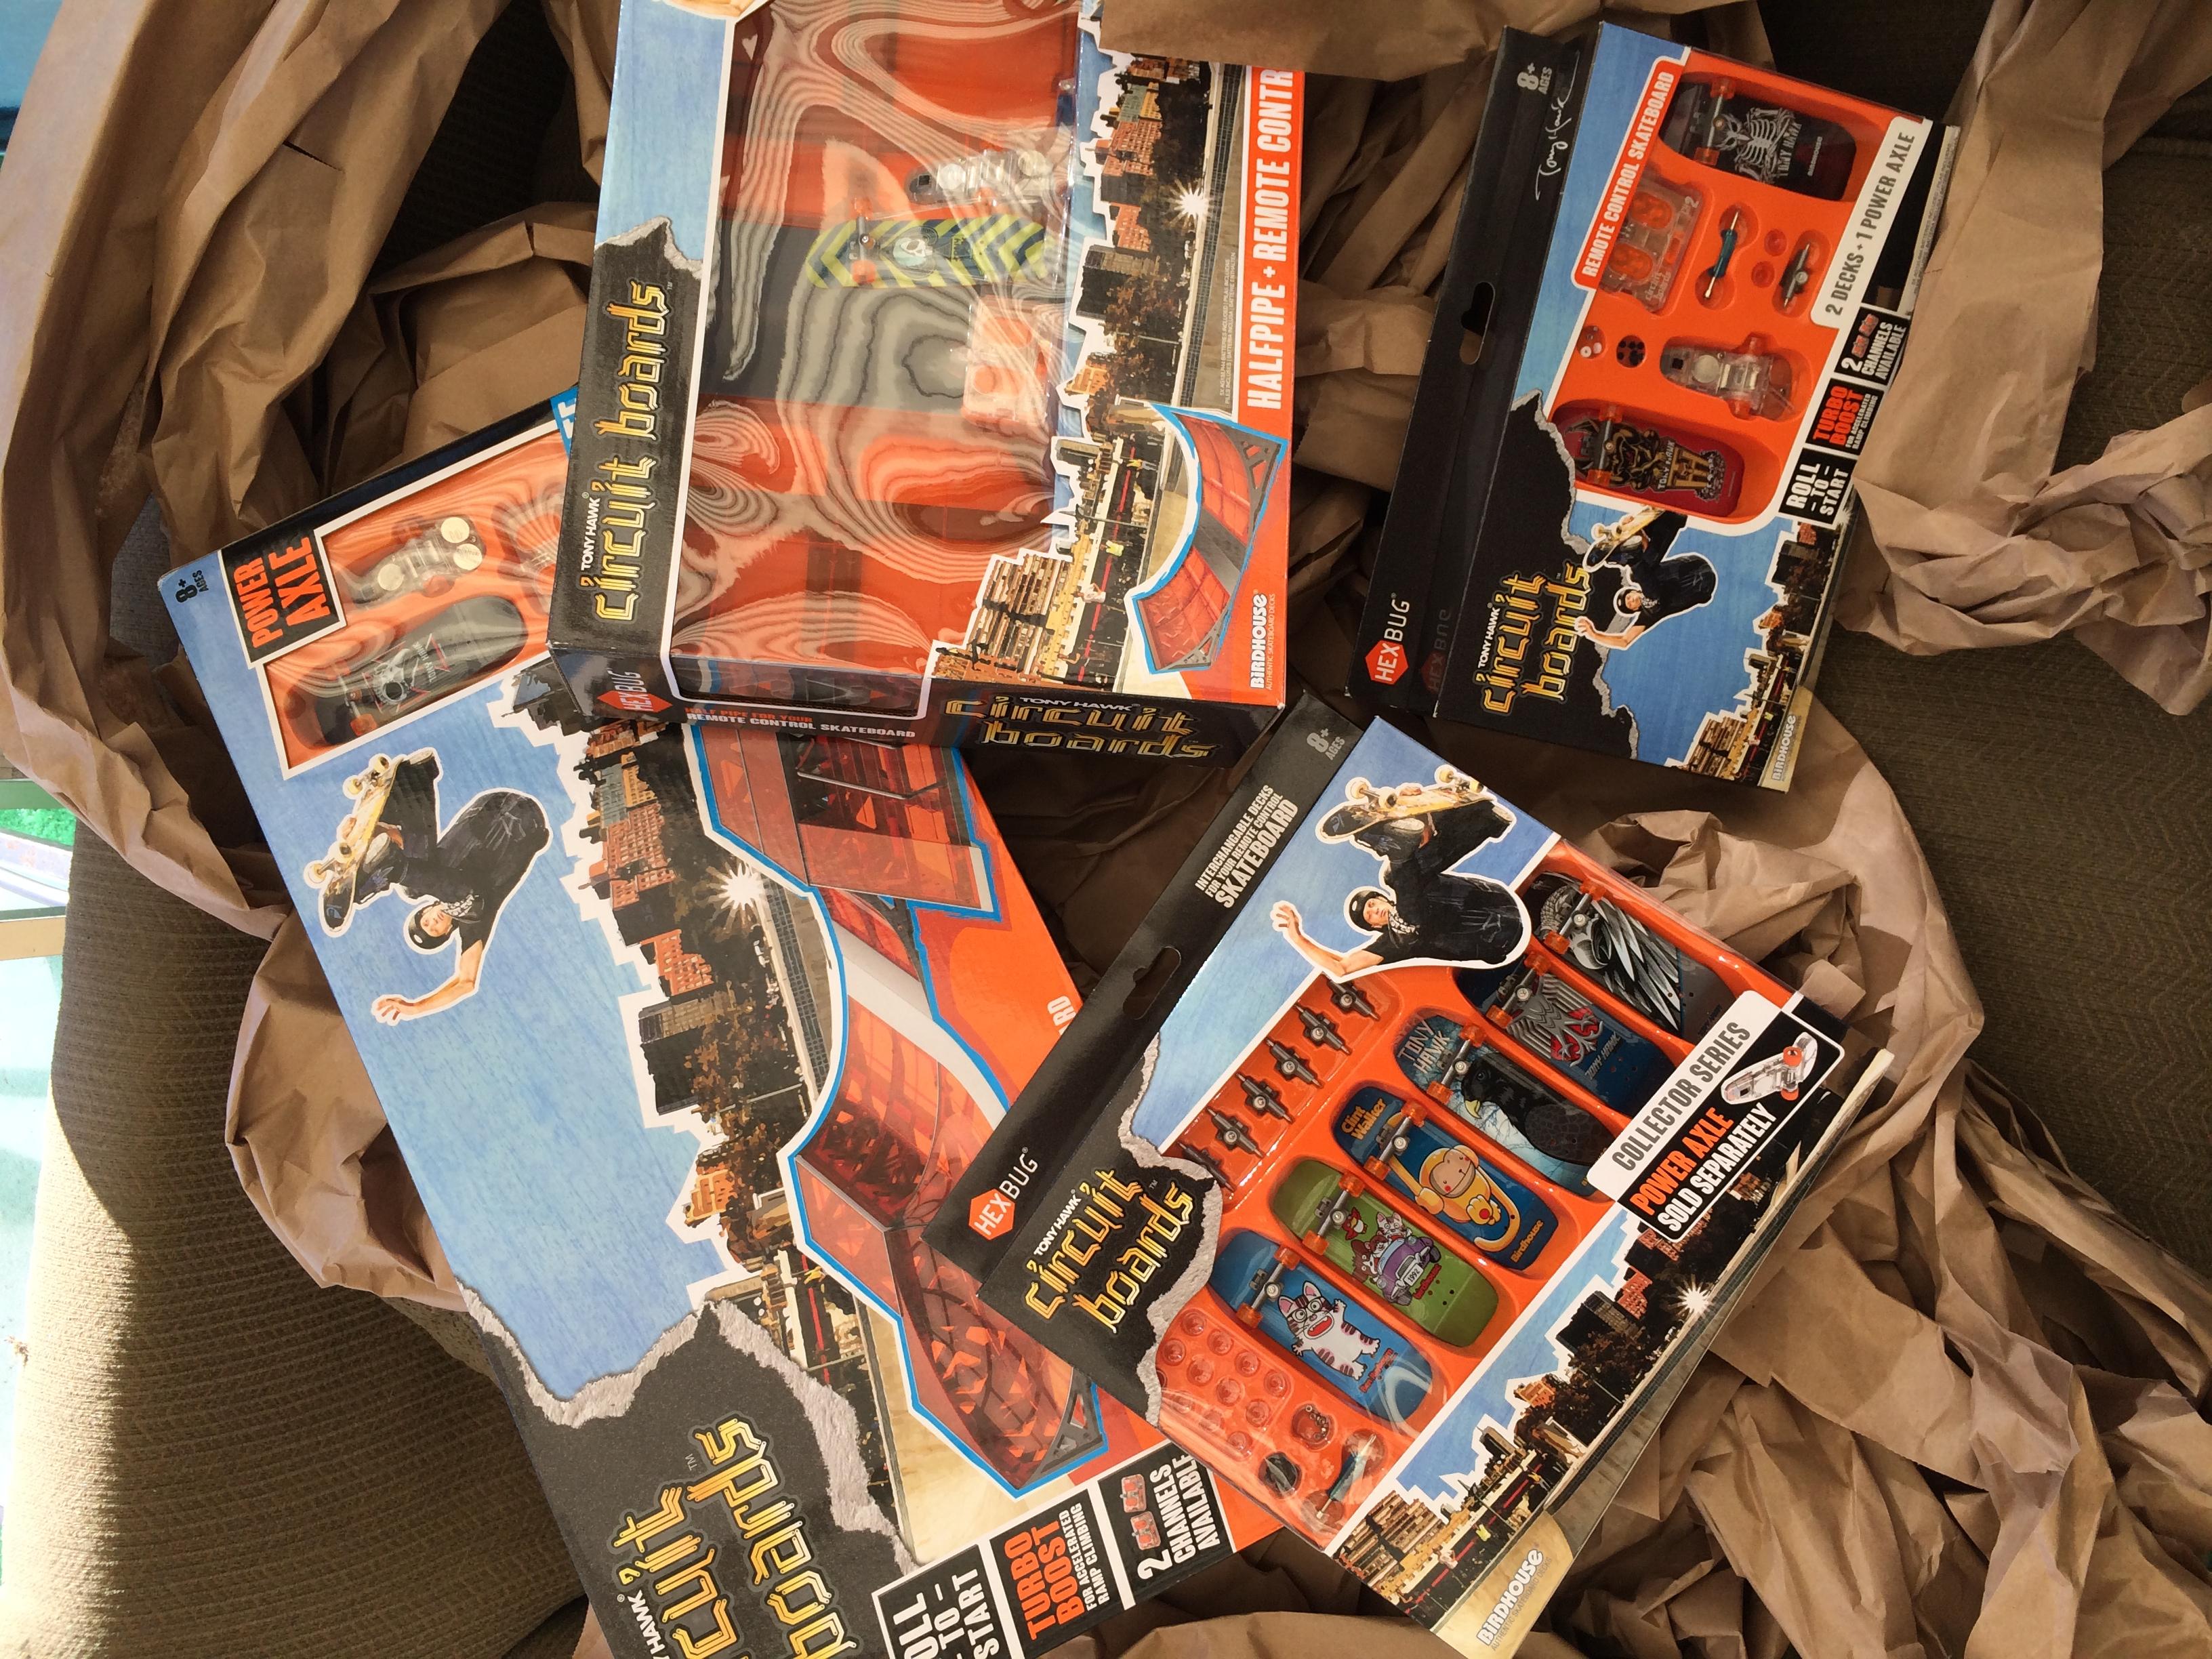 Review Tony Hawk Circuit Boards Remote Control Mini Skateboards Boardbuy Cheap Board Whatd We Get